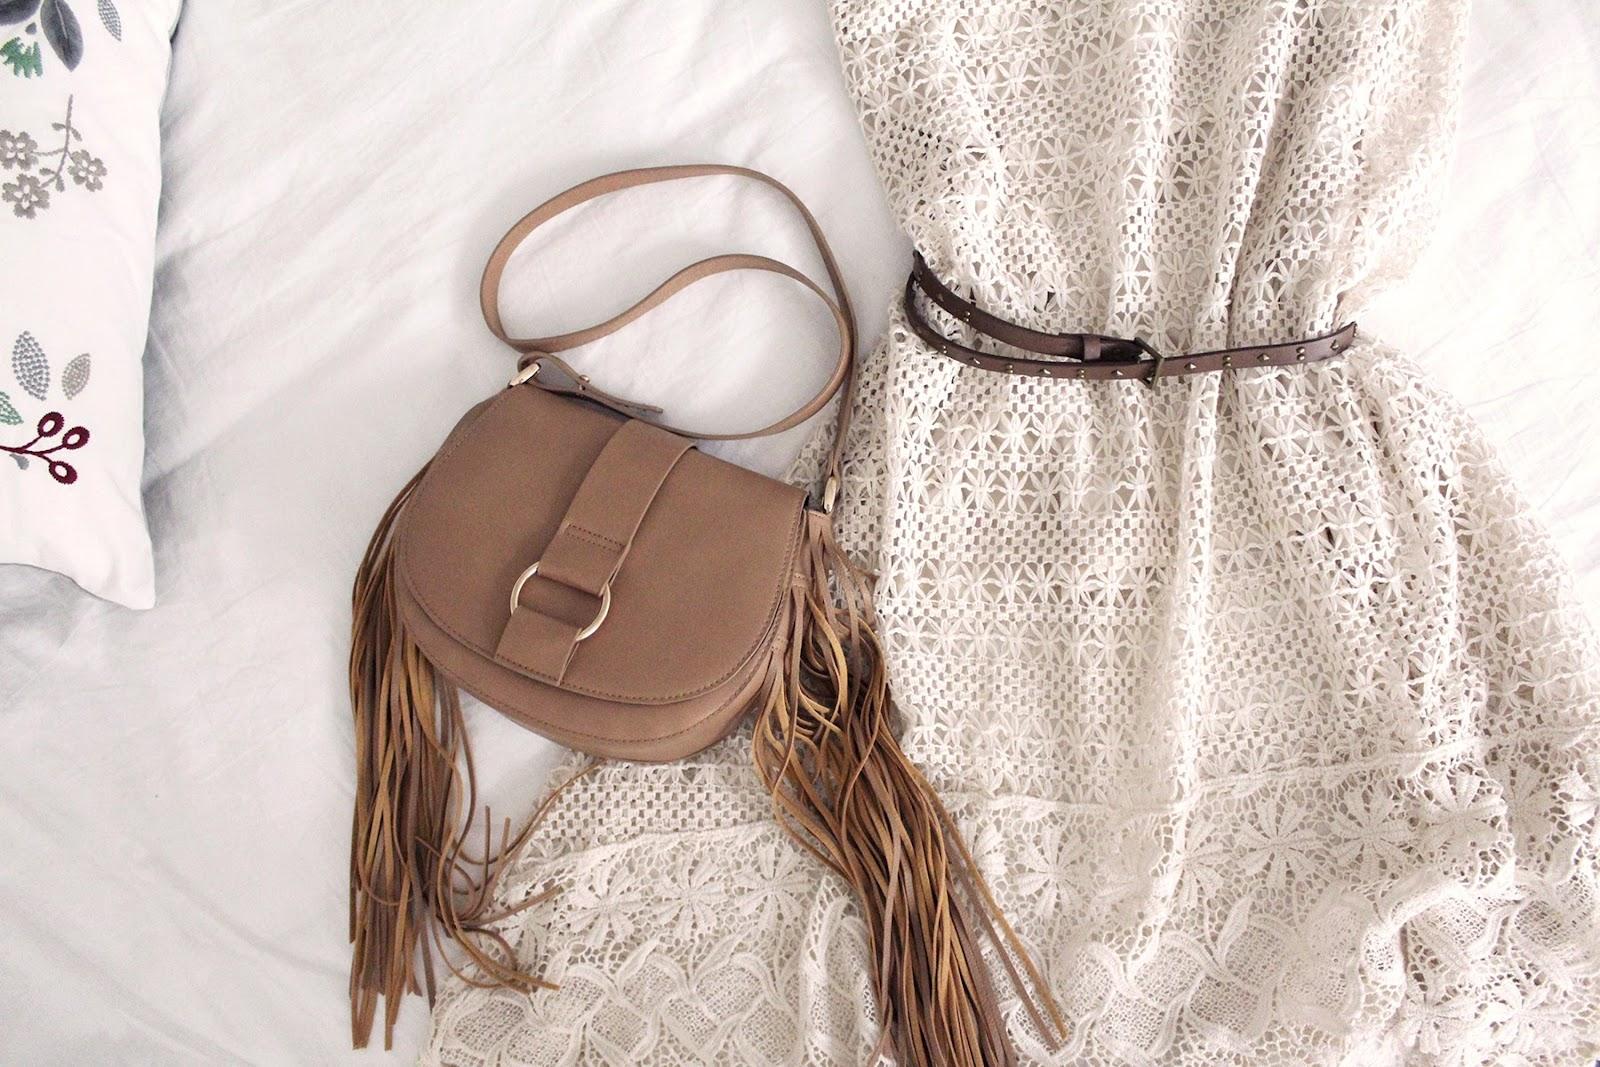 fashion style blogger outfit ootd italian girl italy trend vogue glamour pescara saldi stradivarius h&m borsa tuta vestito camicia giacca